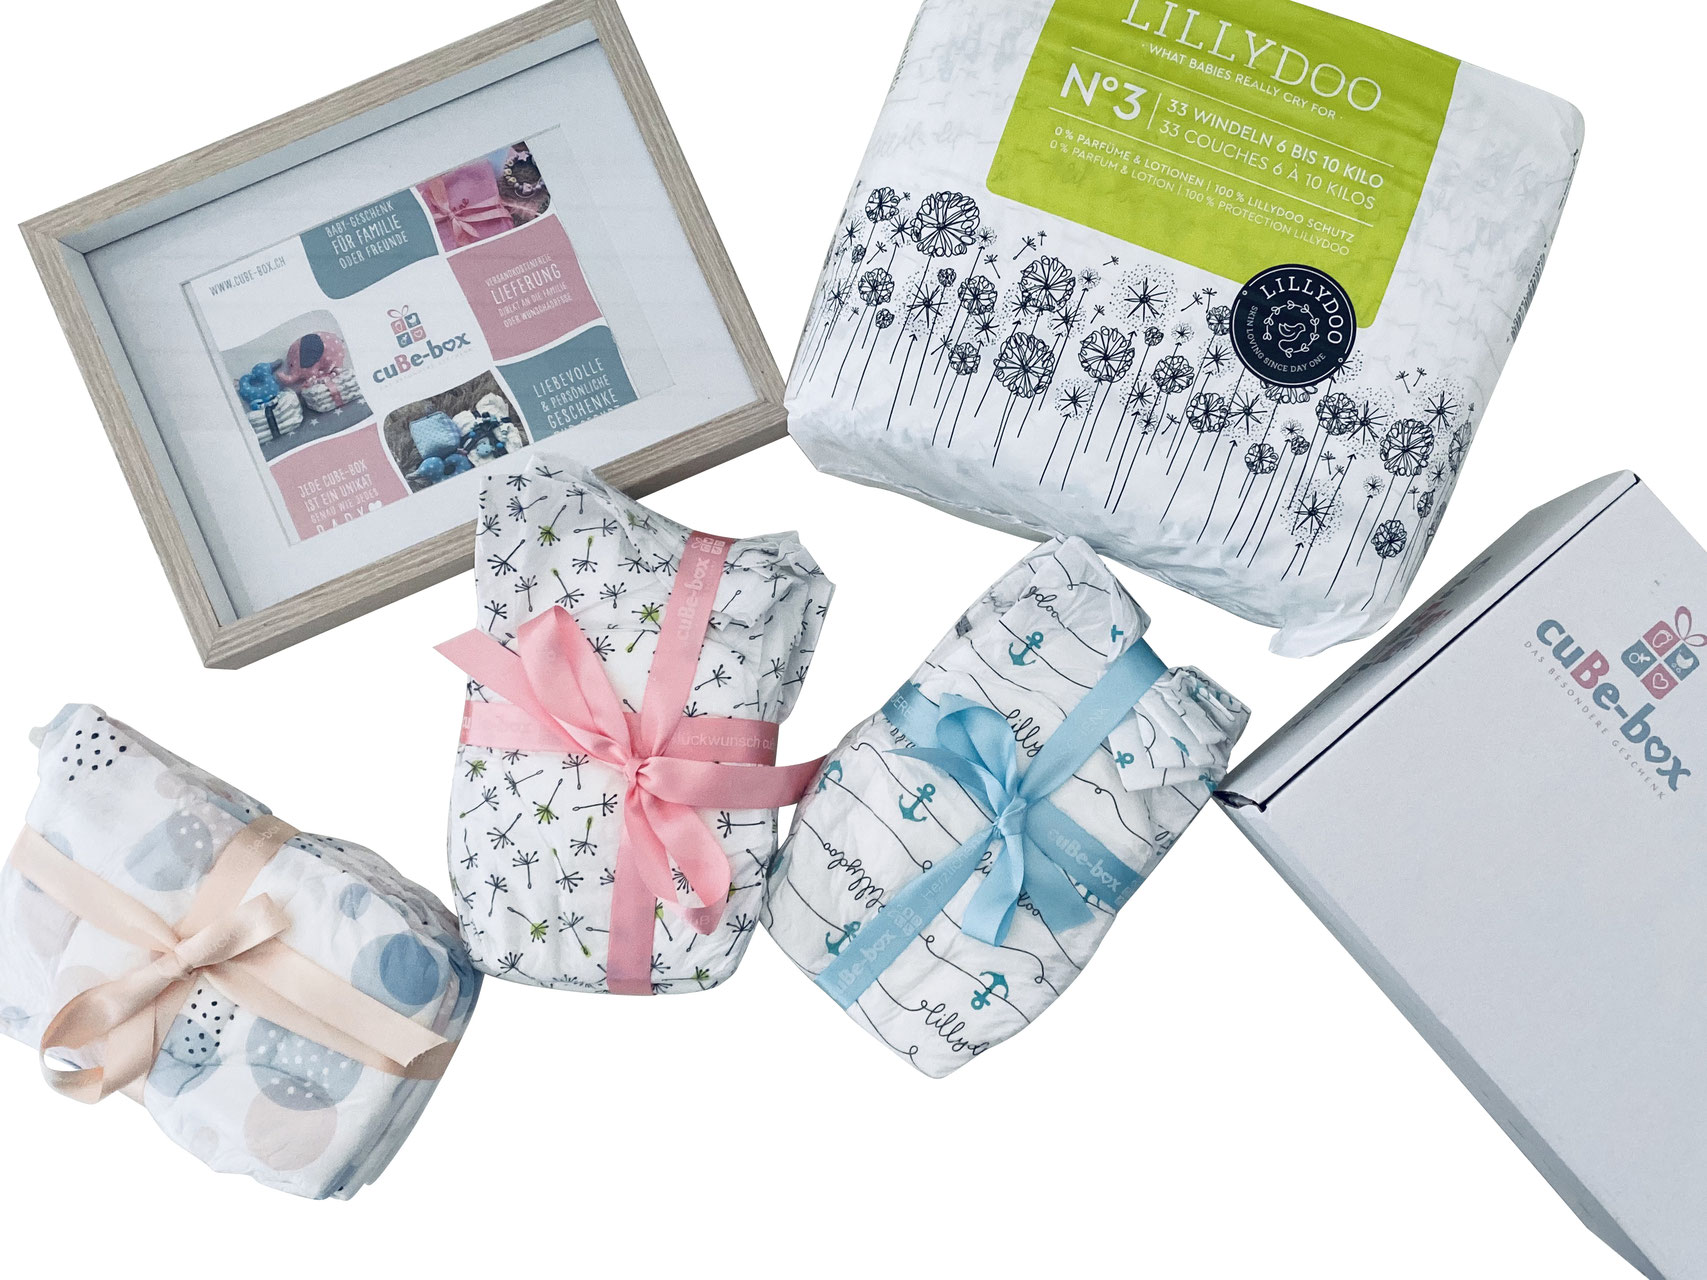 cuBe-box Babygeschenke geschenkset windeln babybox